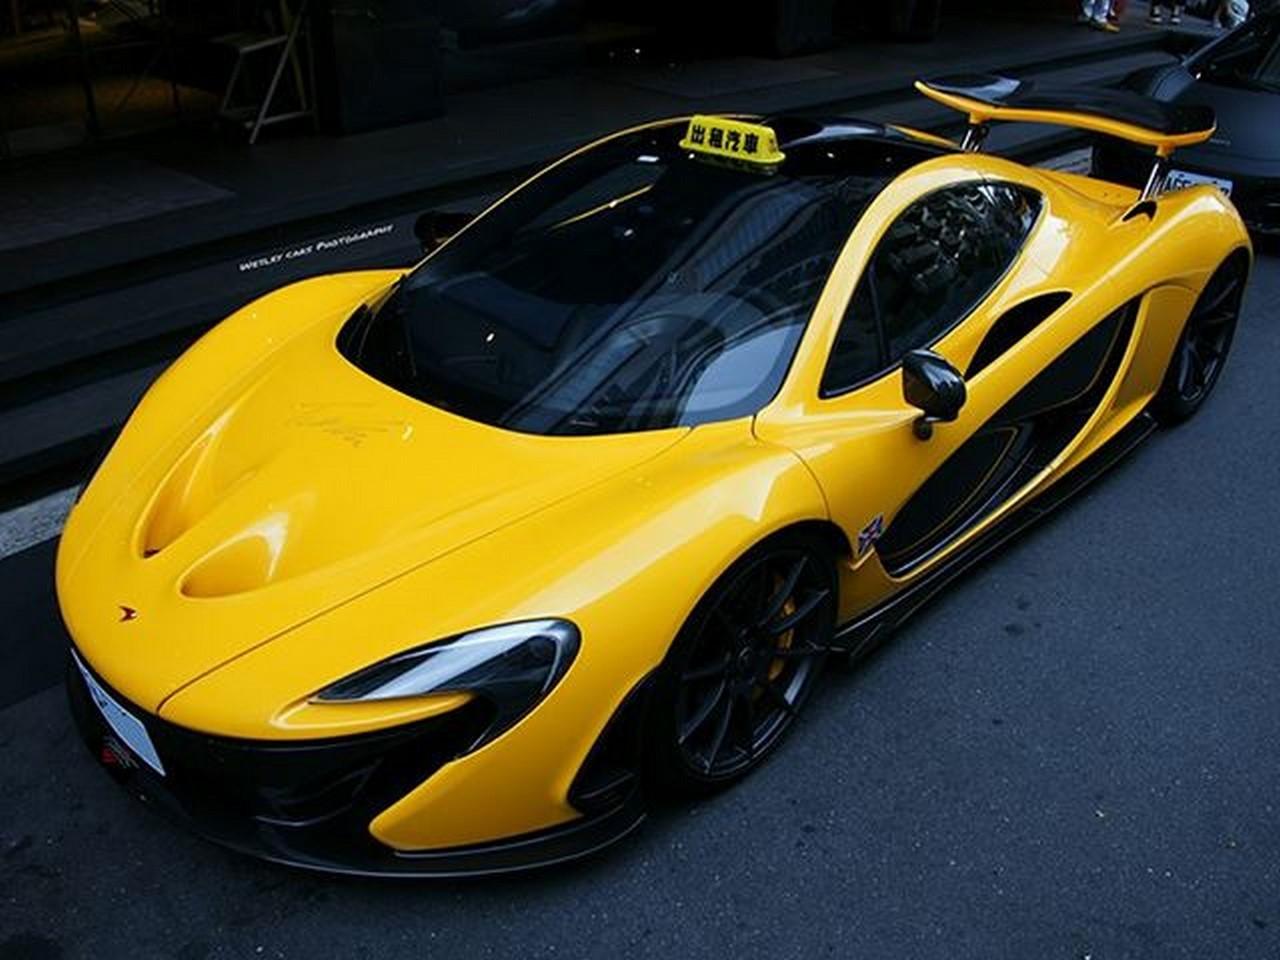 Insolite : une McLaren P1 version taxi